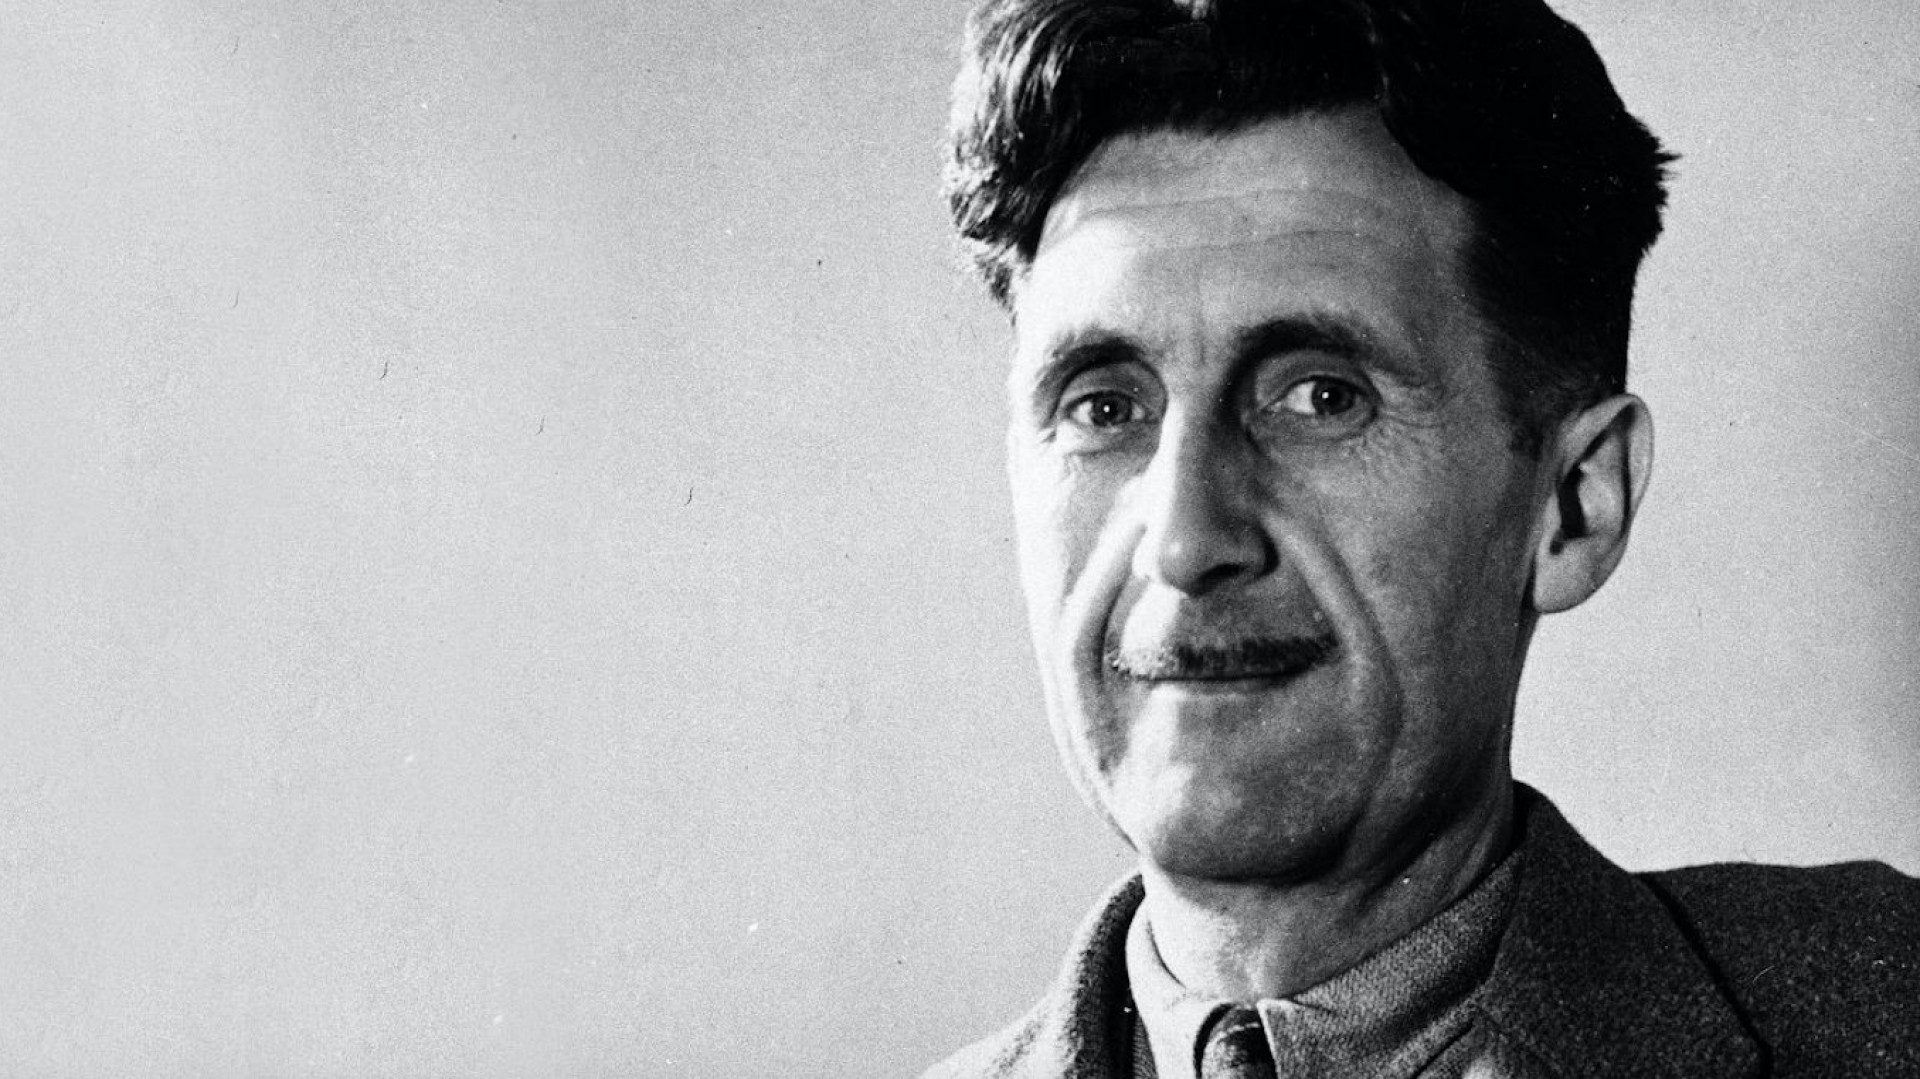 021 George Orwellfit13552c762ssl1 Essay Example Orwell Frightening Essays 1984 Summary Collected Pdf On Writing 1920